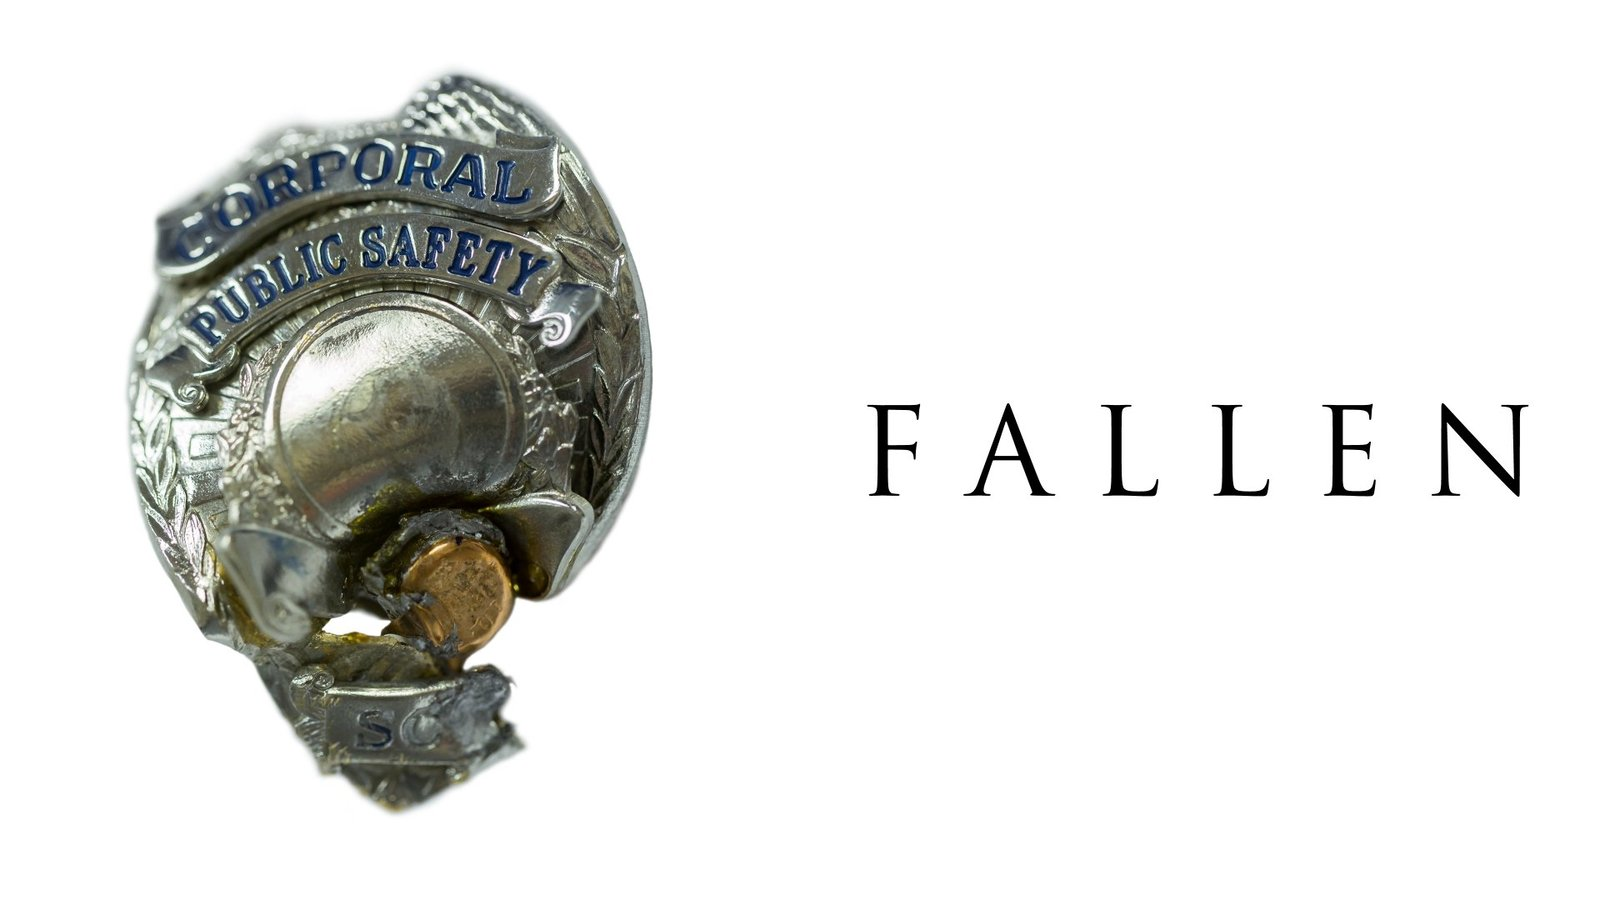 Fallen - Officers Killed in the Line of Duty